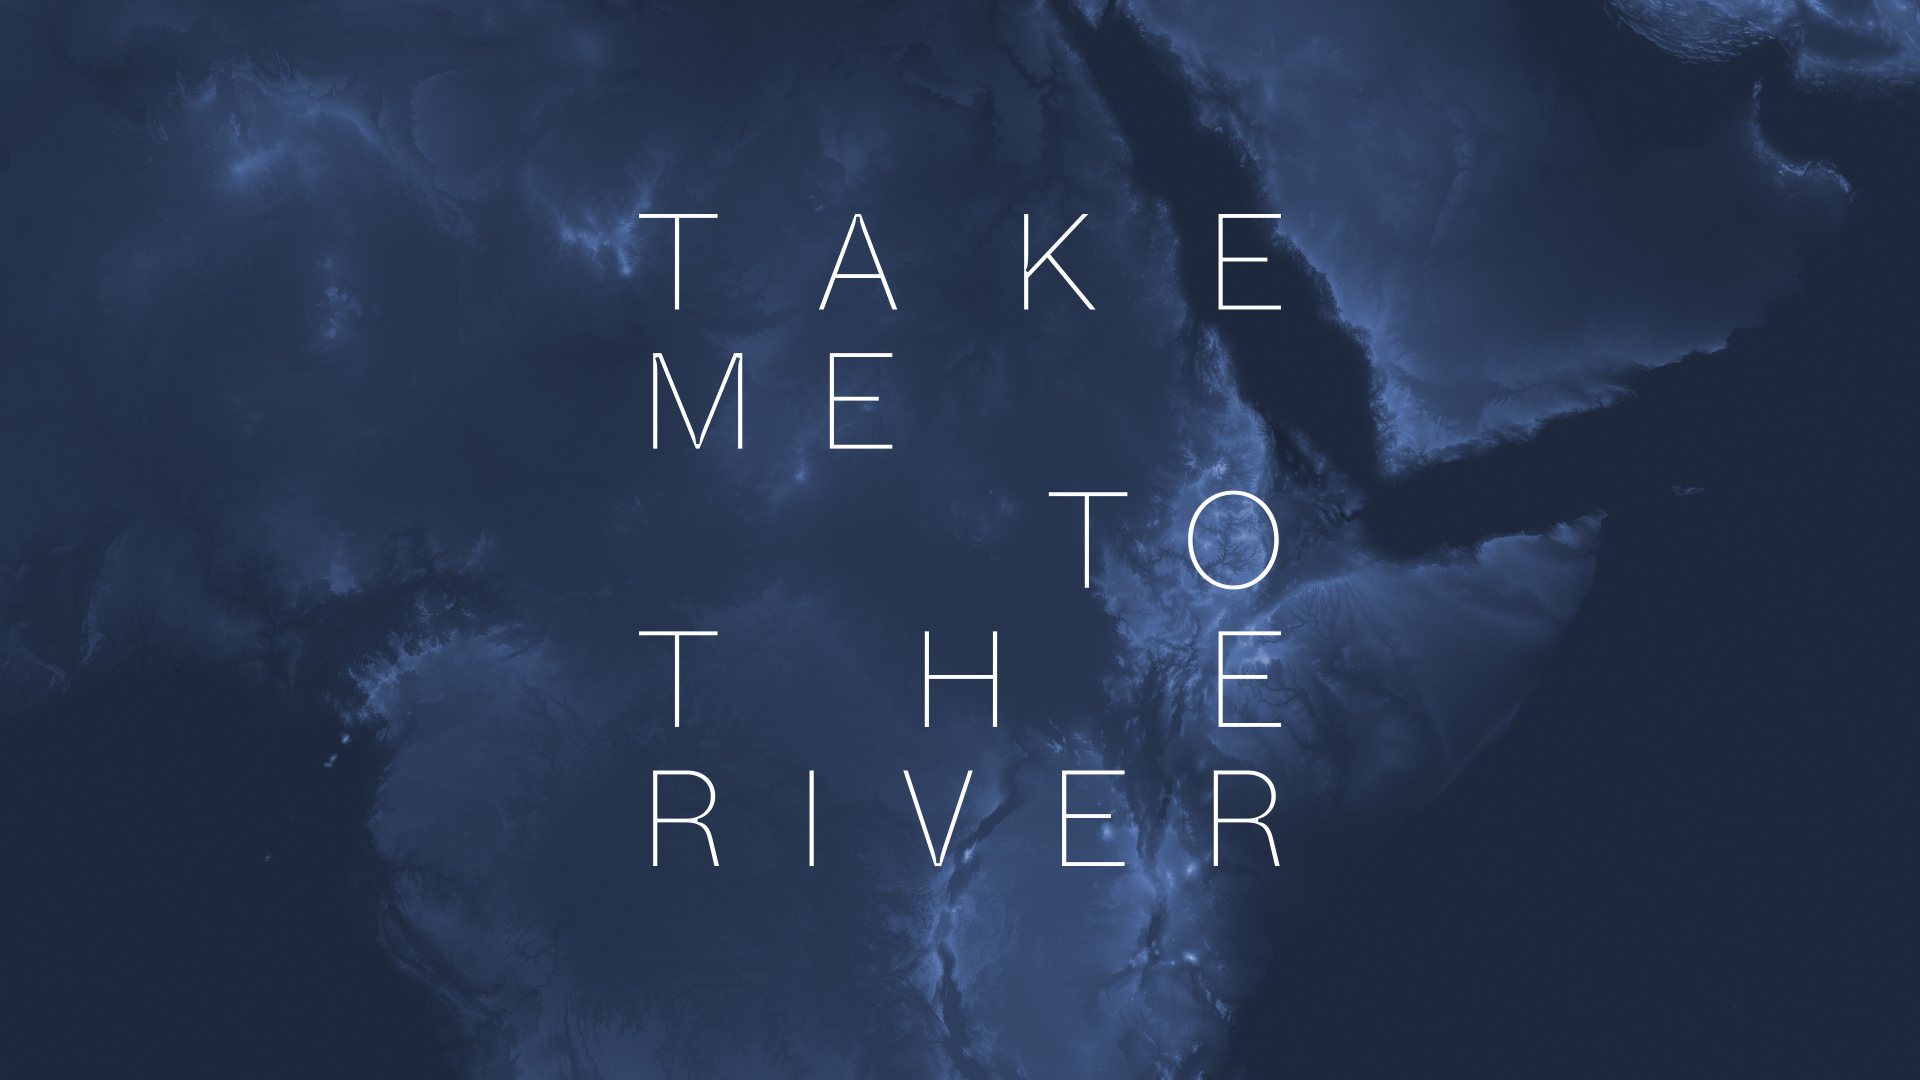 201218 take me to the river 1920x1080